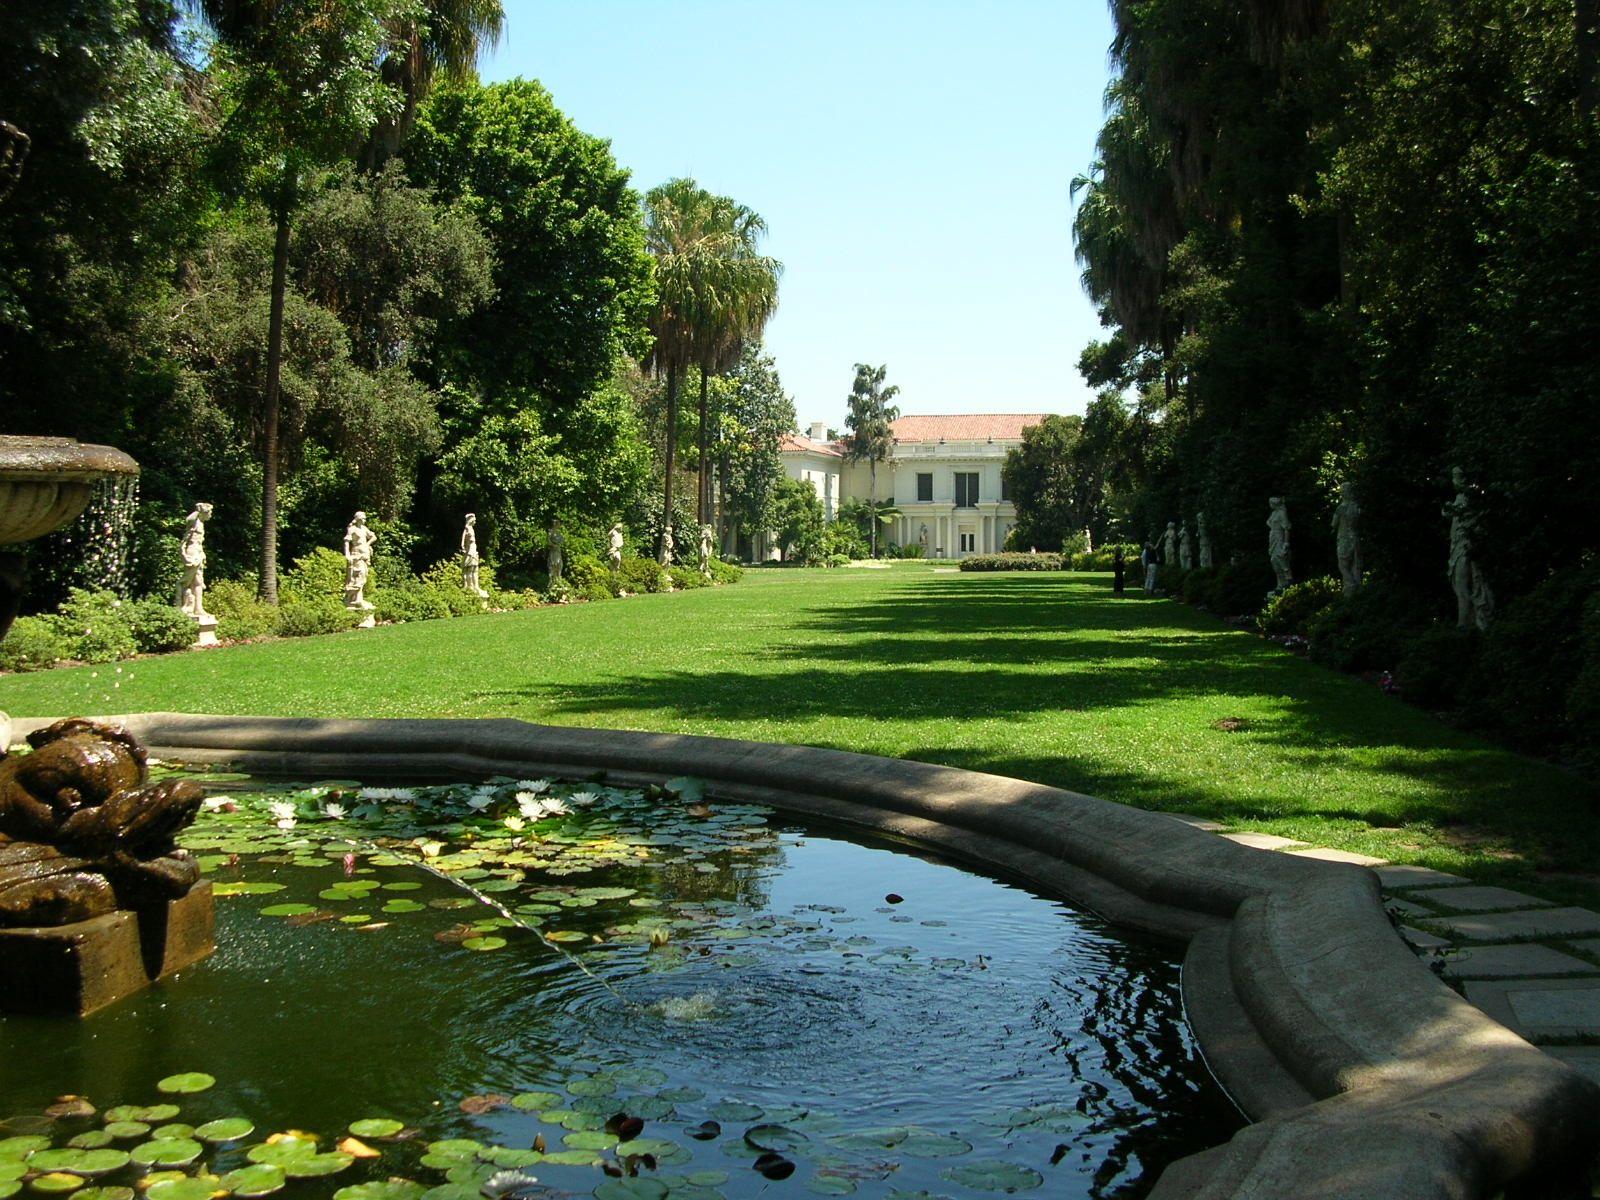 a3e72e9909cd3e720f5db48a809f30aa - Huntington Library And Botanical Gardens Pasadena